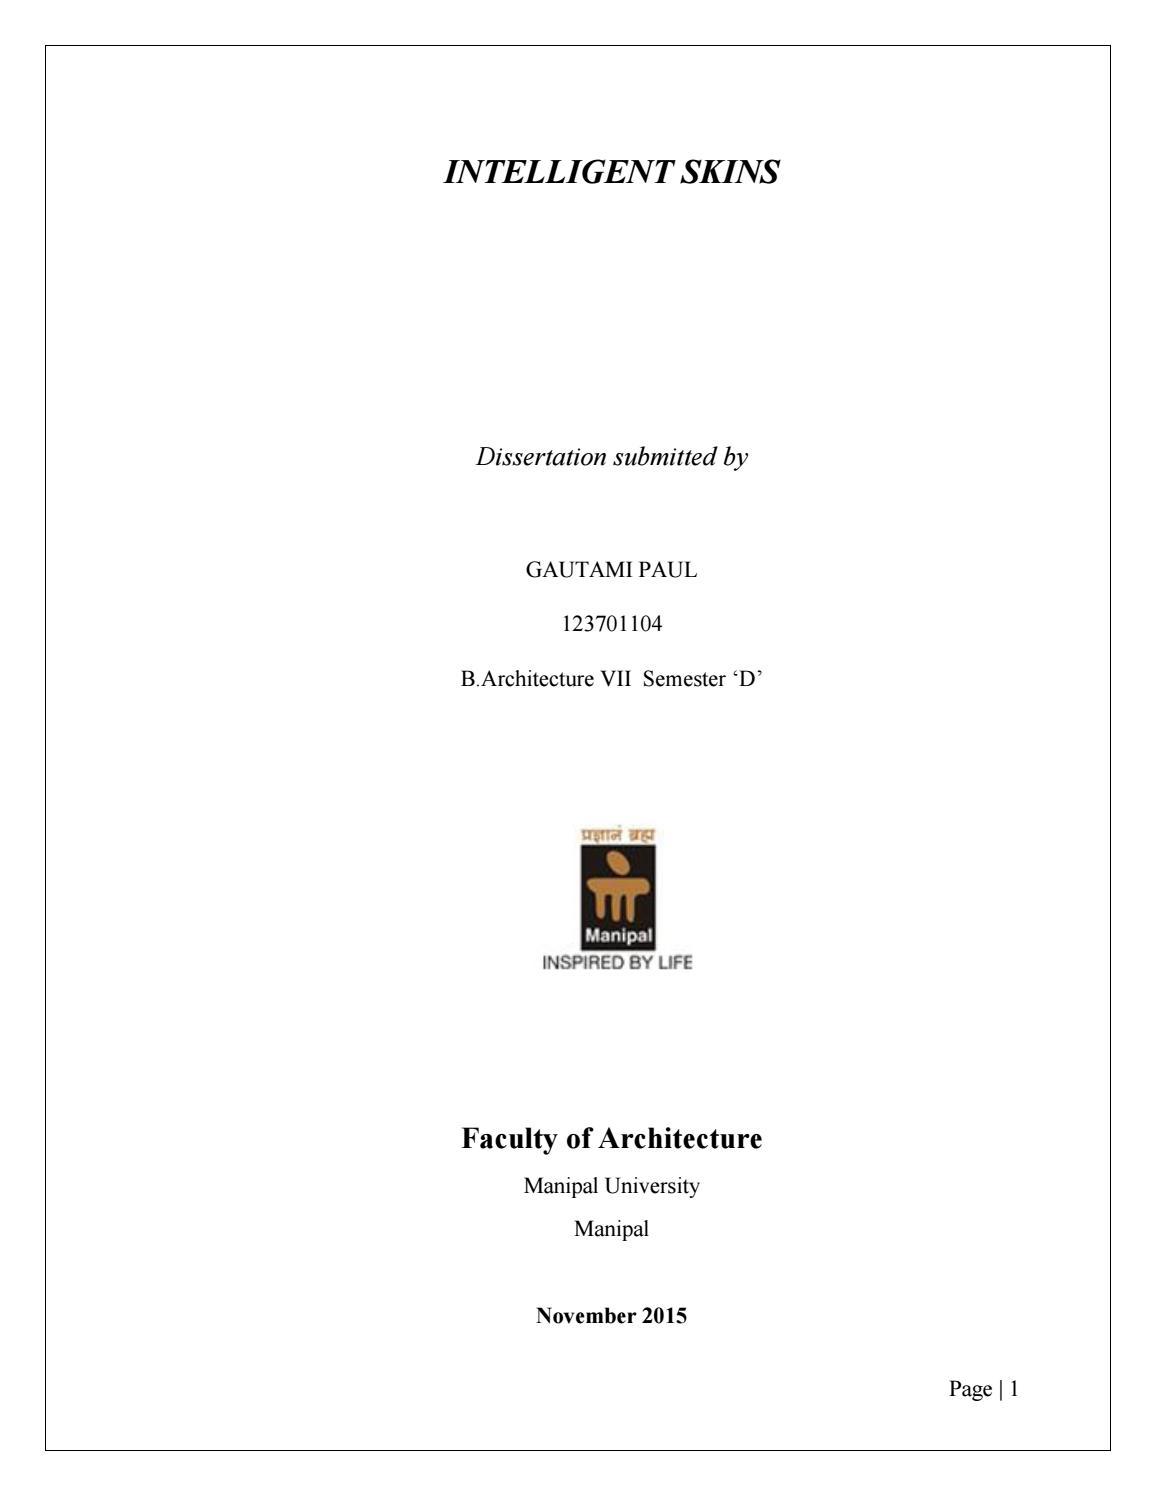 Phd thesis thanks